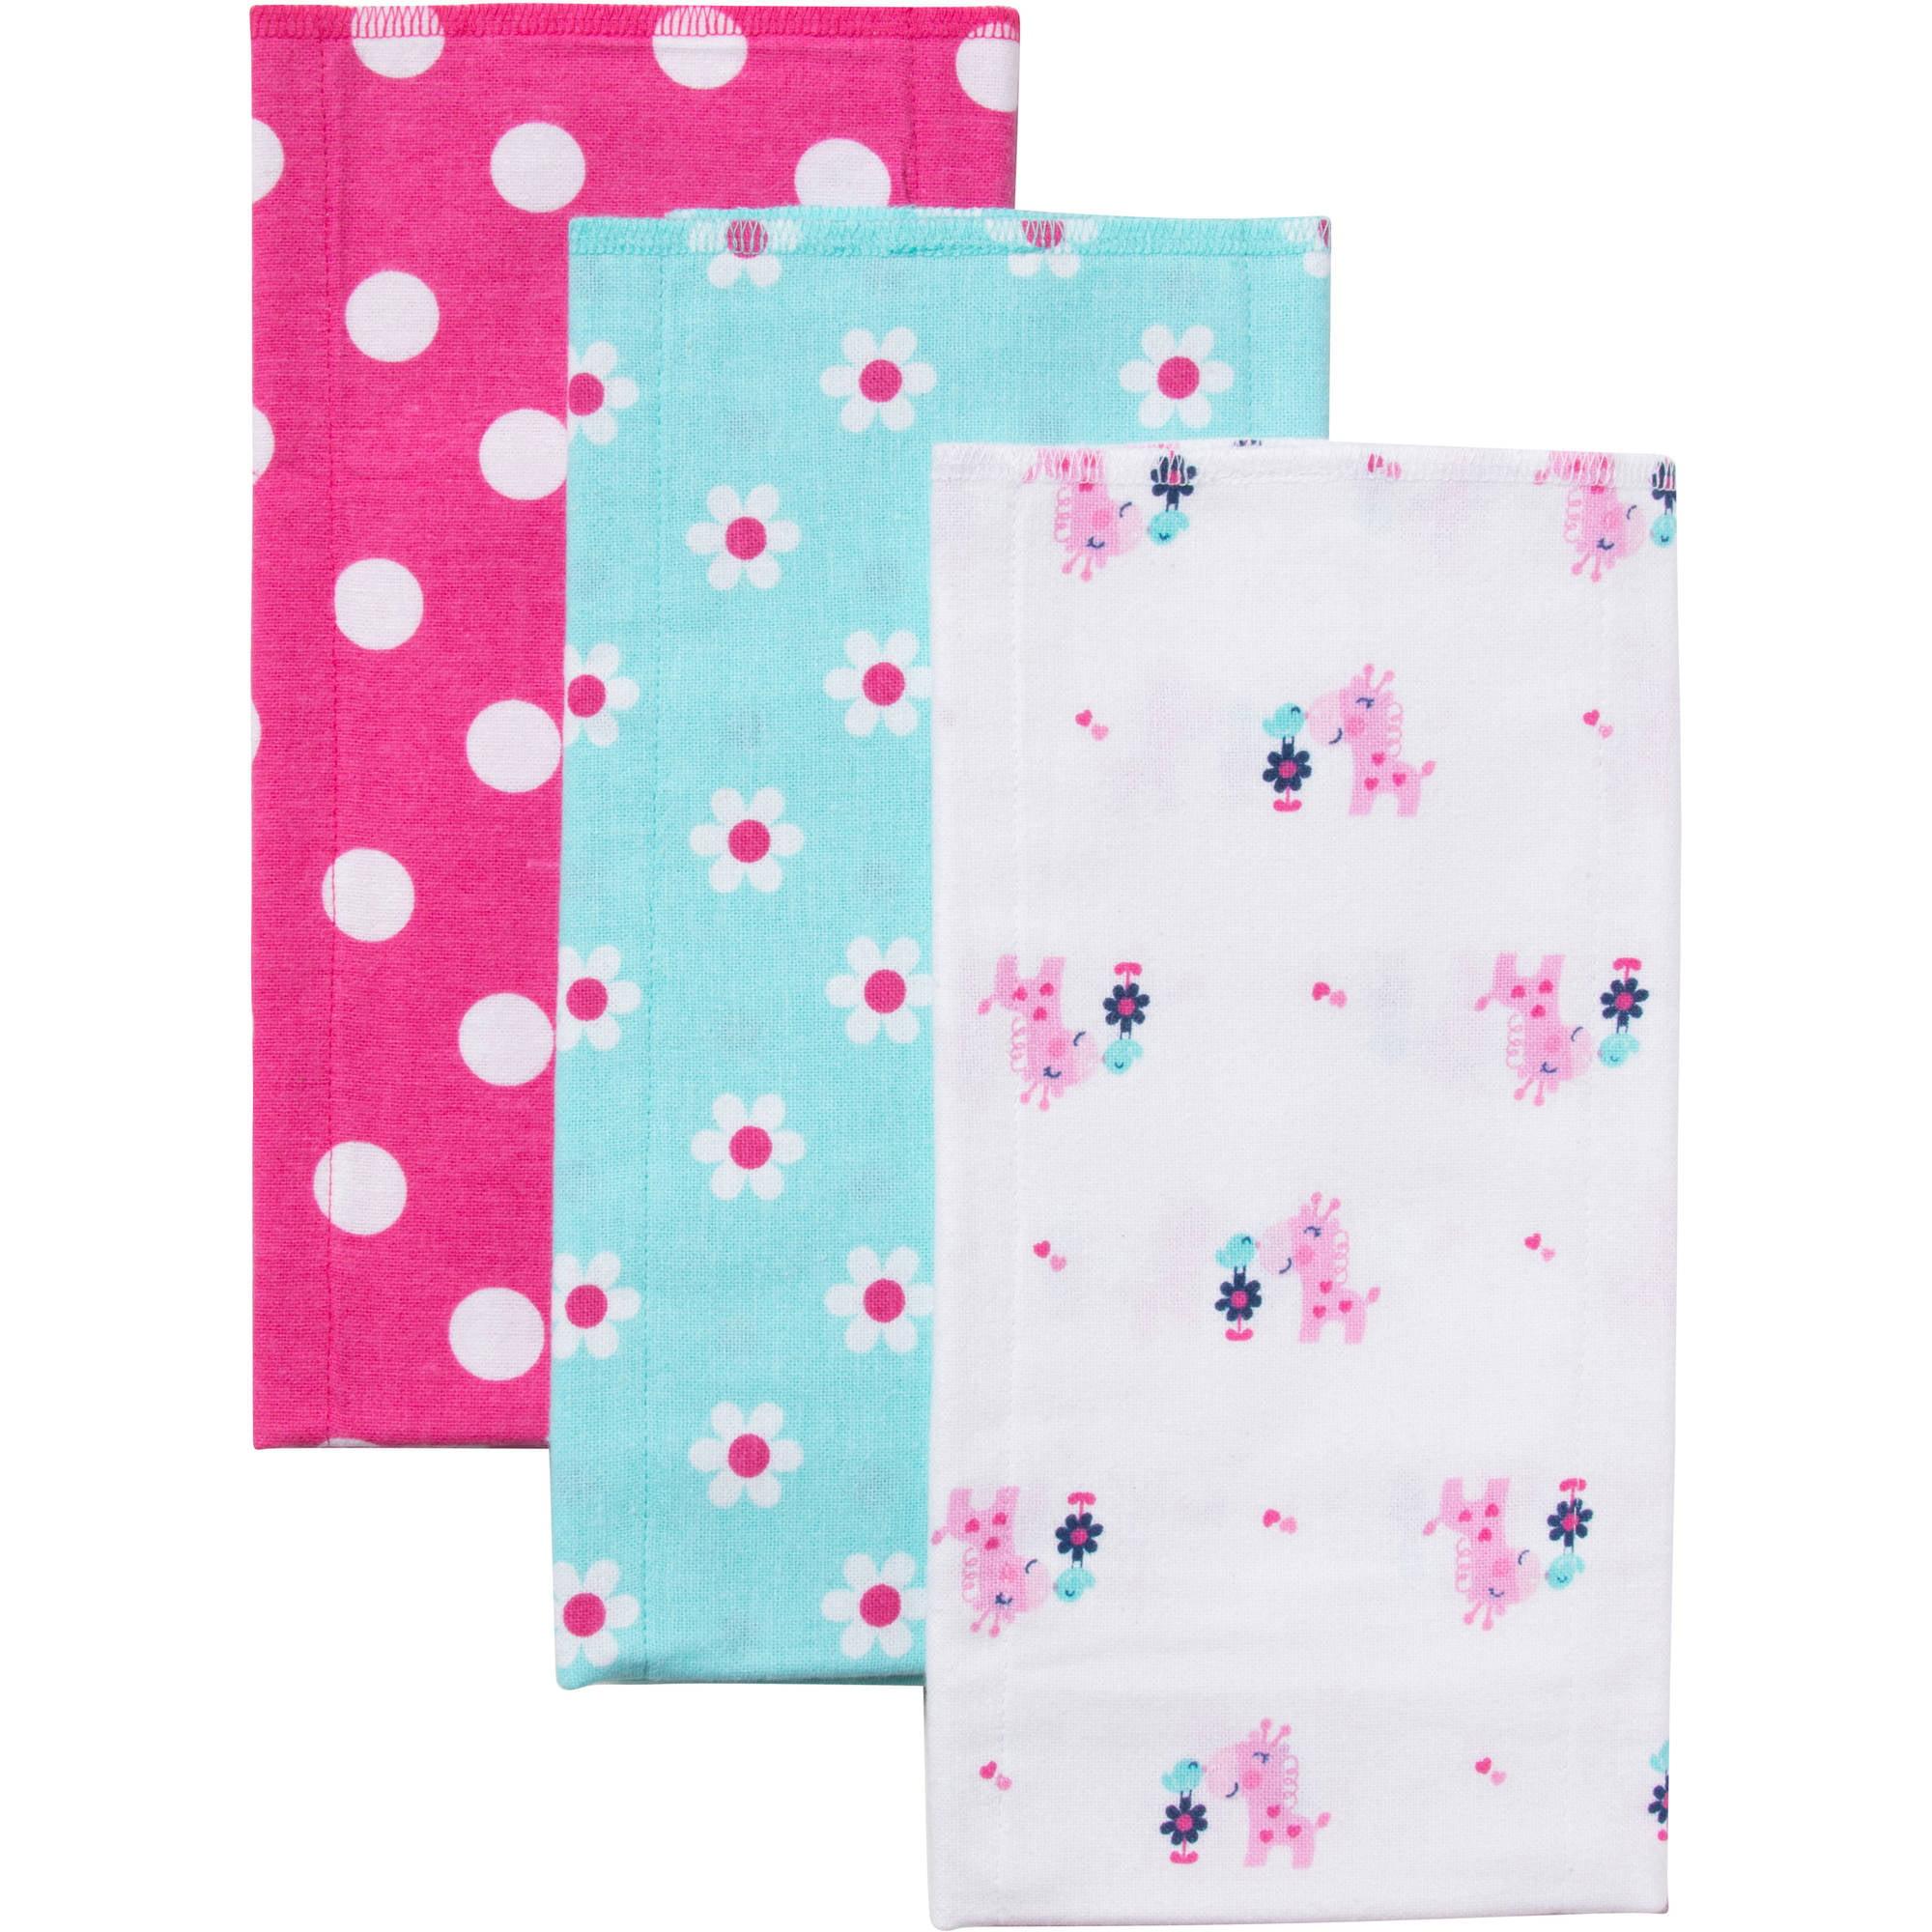 Gerber Flannel Burpcloths, Girl, 3-Pack